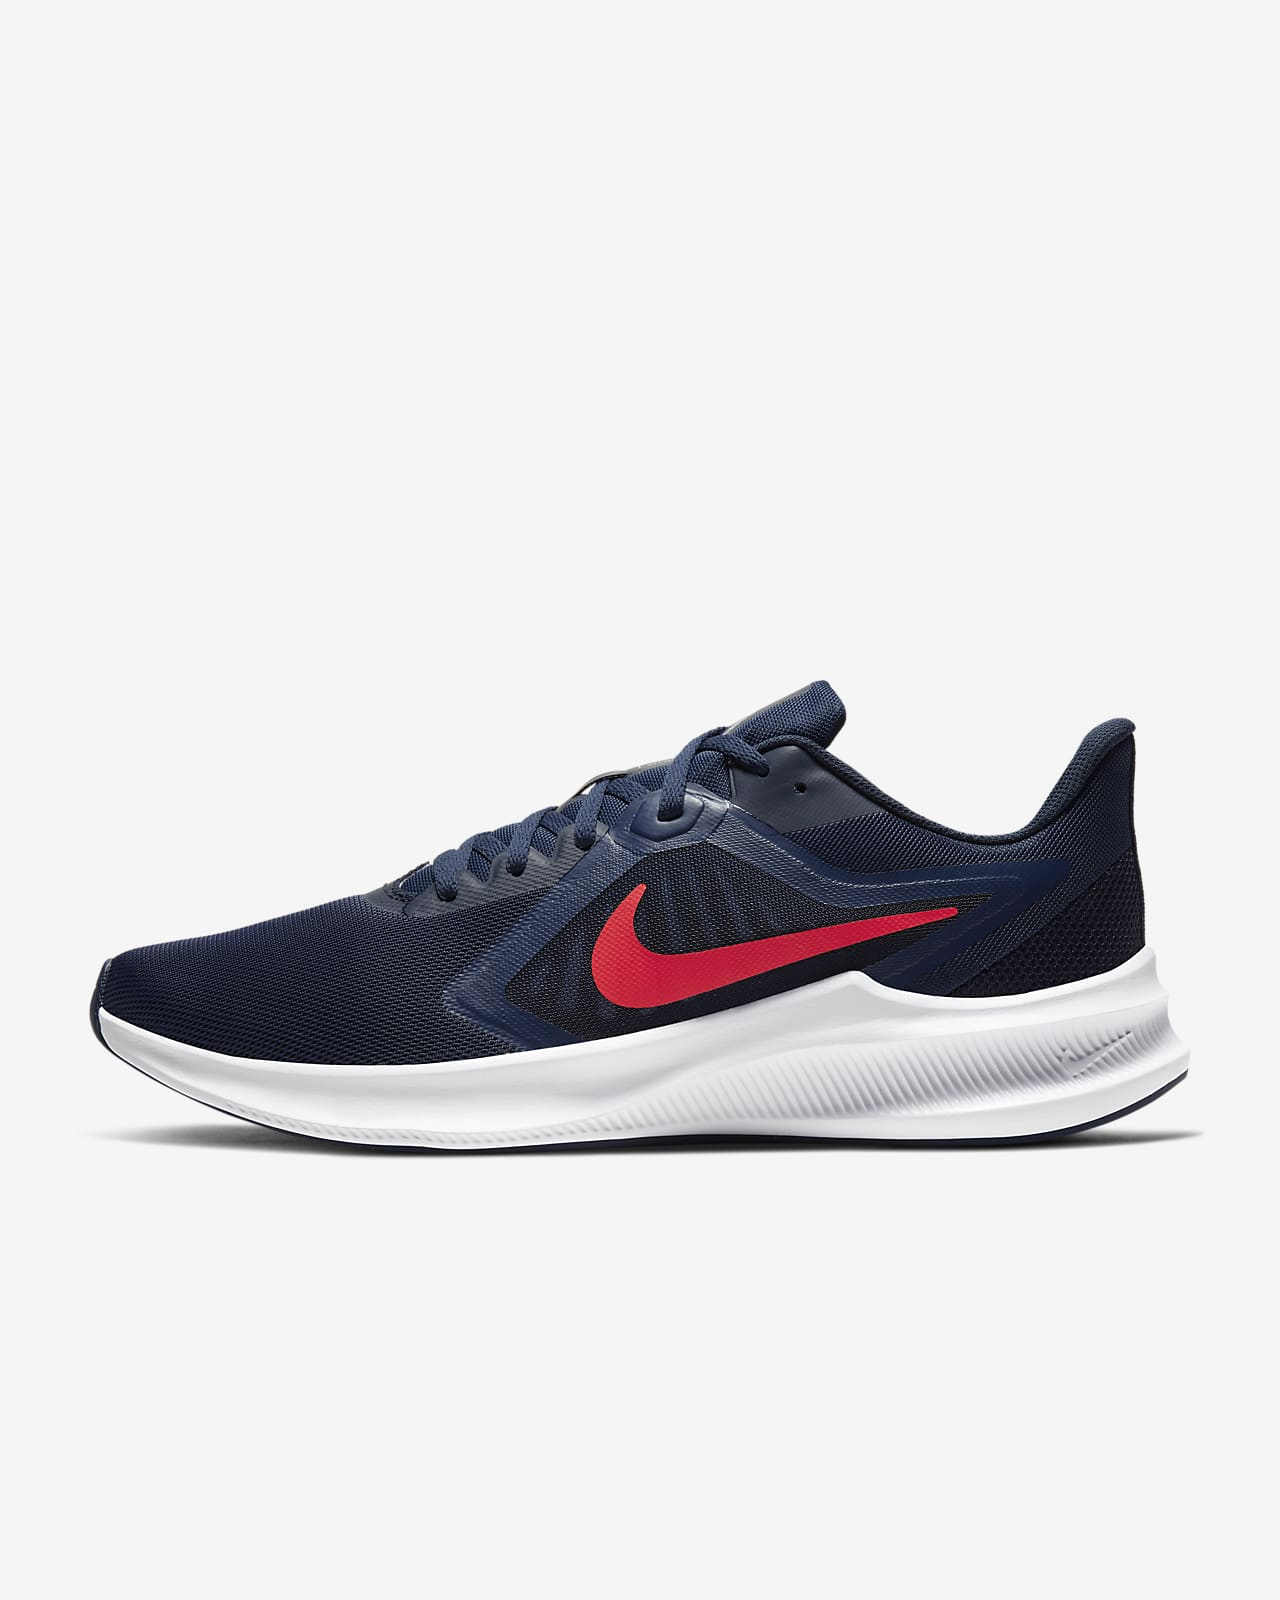 Sapatilhas de running Nike Downshifter 10 para homem